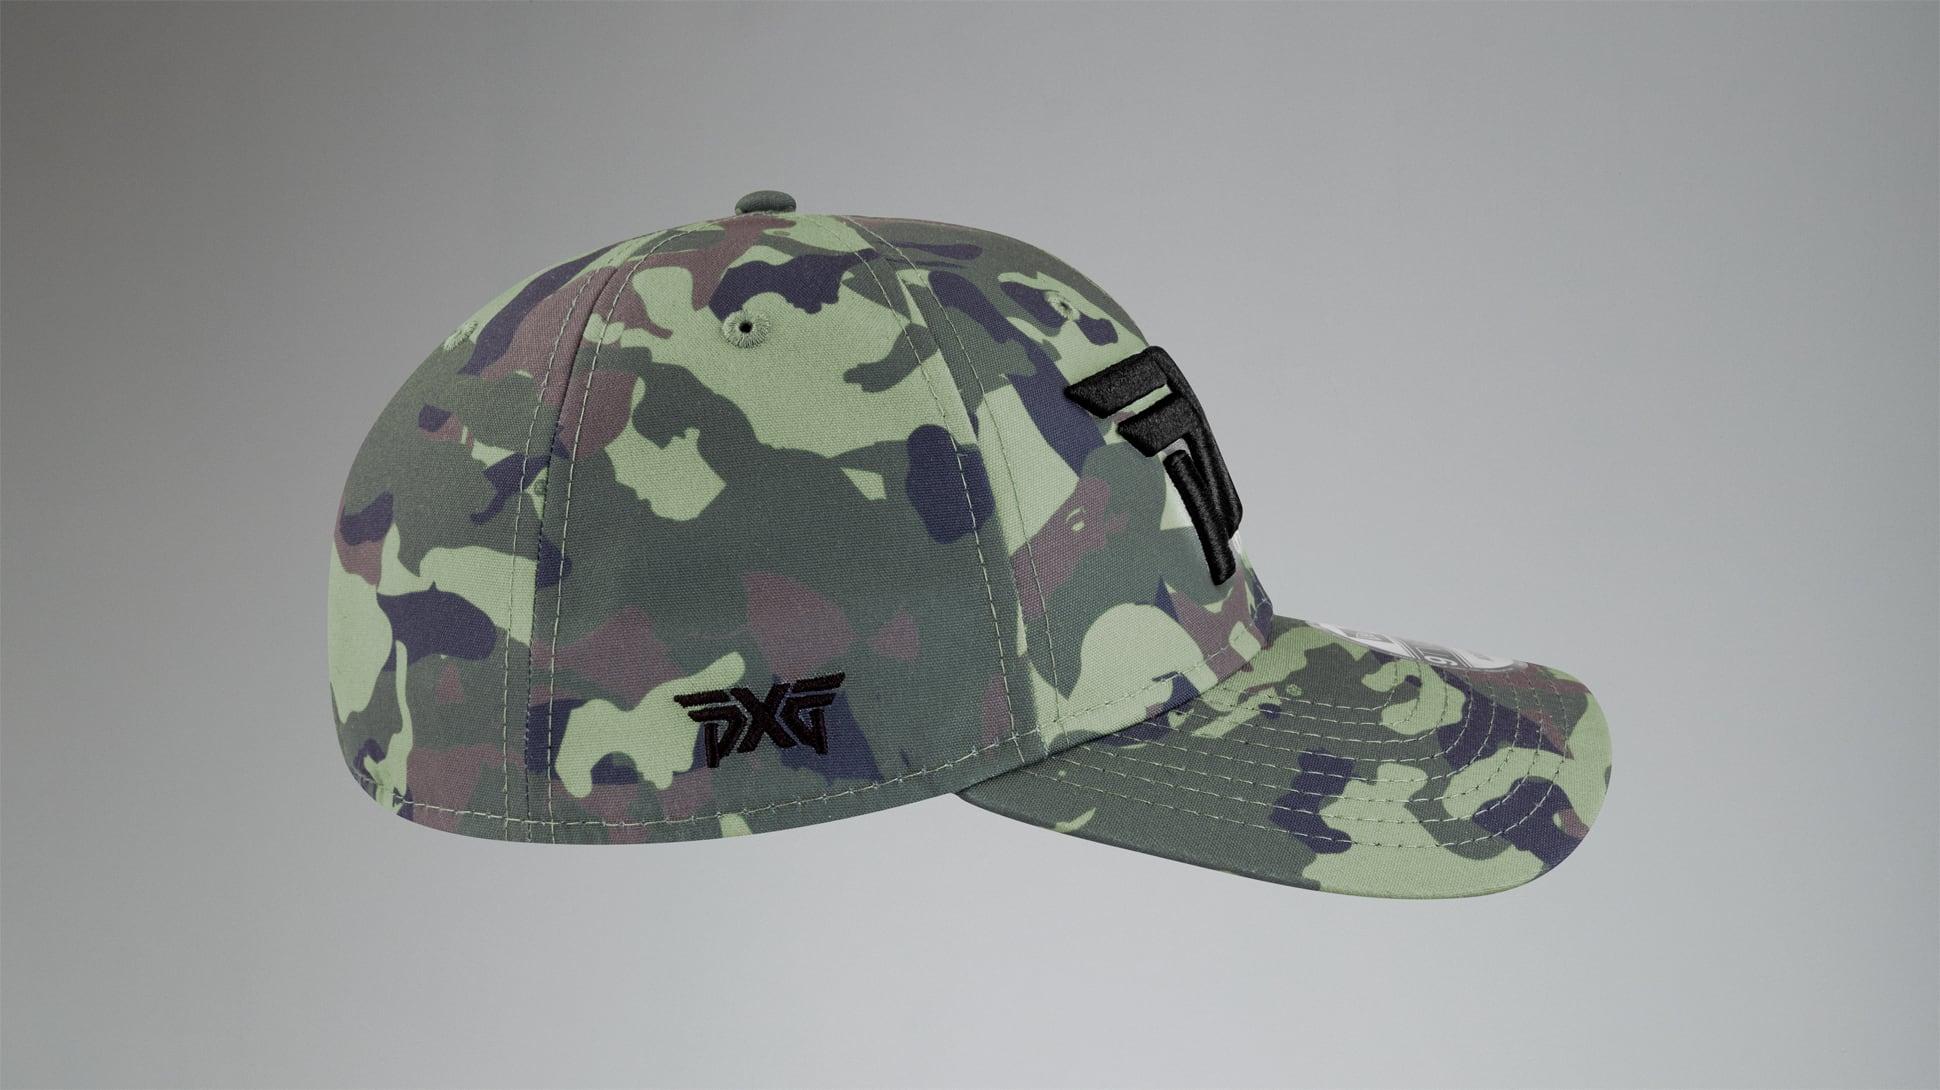 Jungle Camo 9TWENTY Cap Image 3